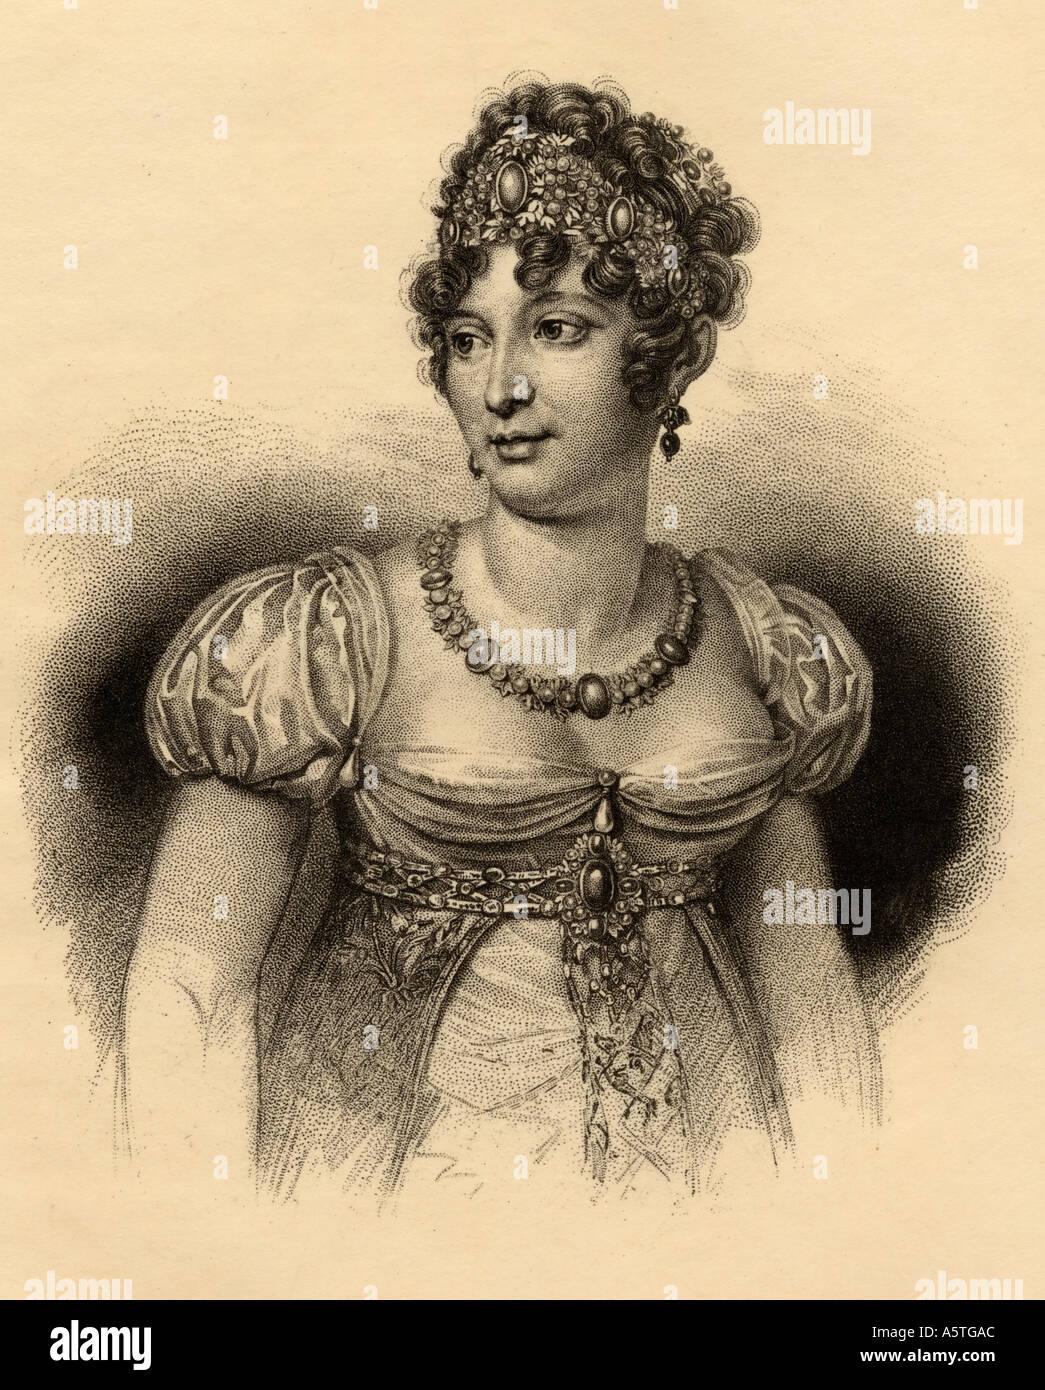 Maria Annunziata Carolina Murat, aka Caroline Bonaparte, 1782 - 1839.  Queen consort of Naples.  Sister of Napoleón. - Stock Image